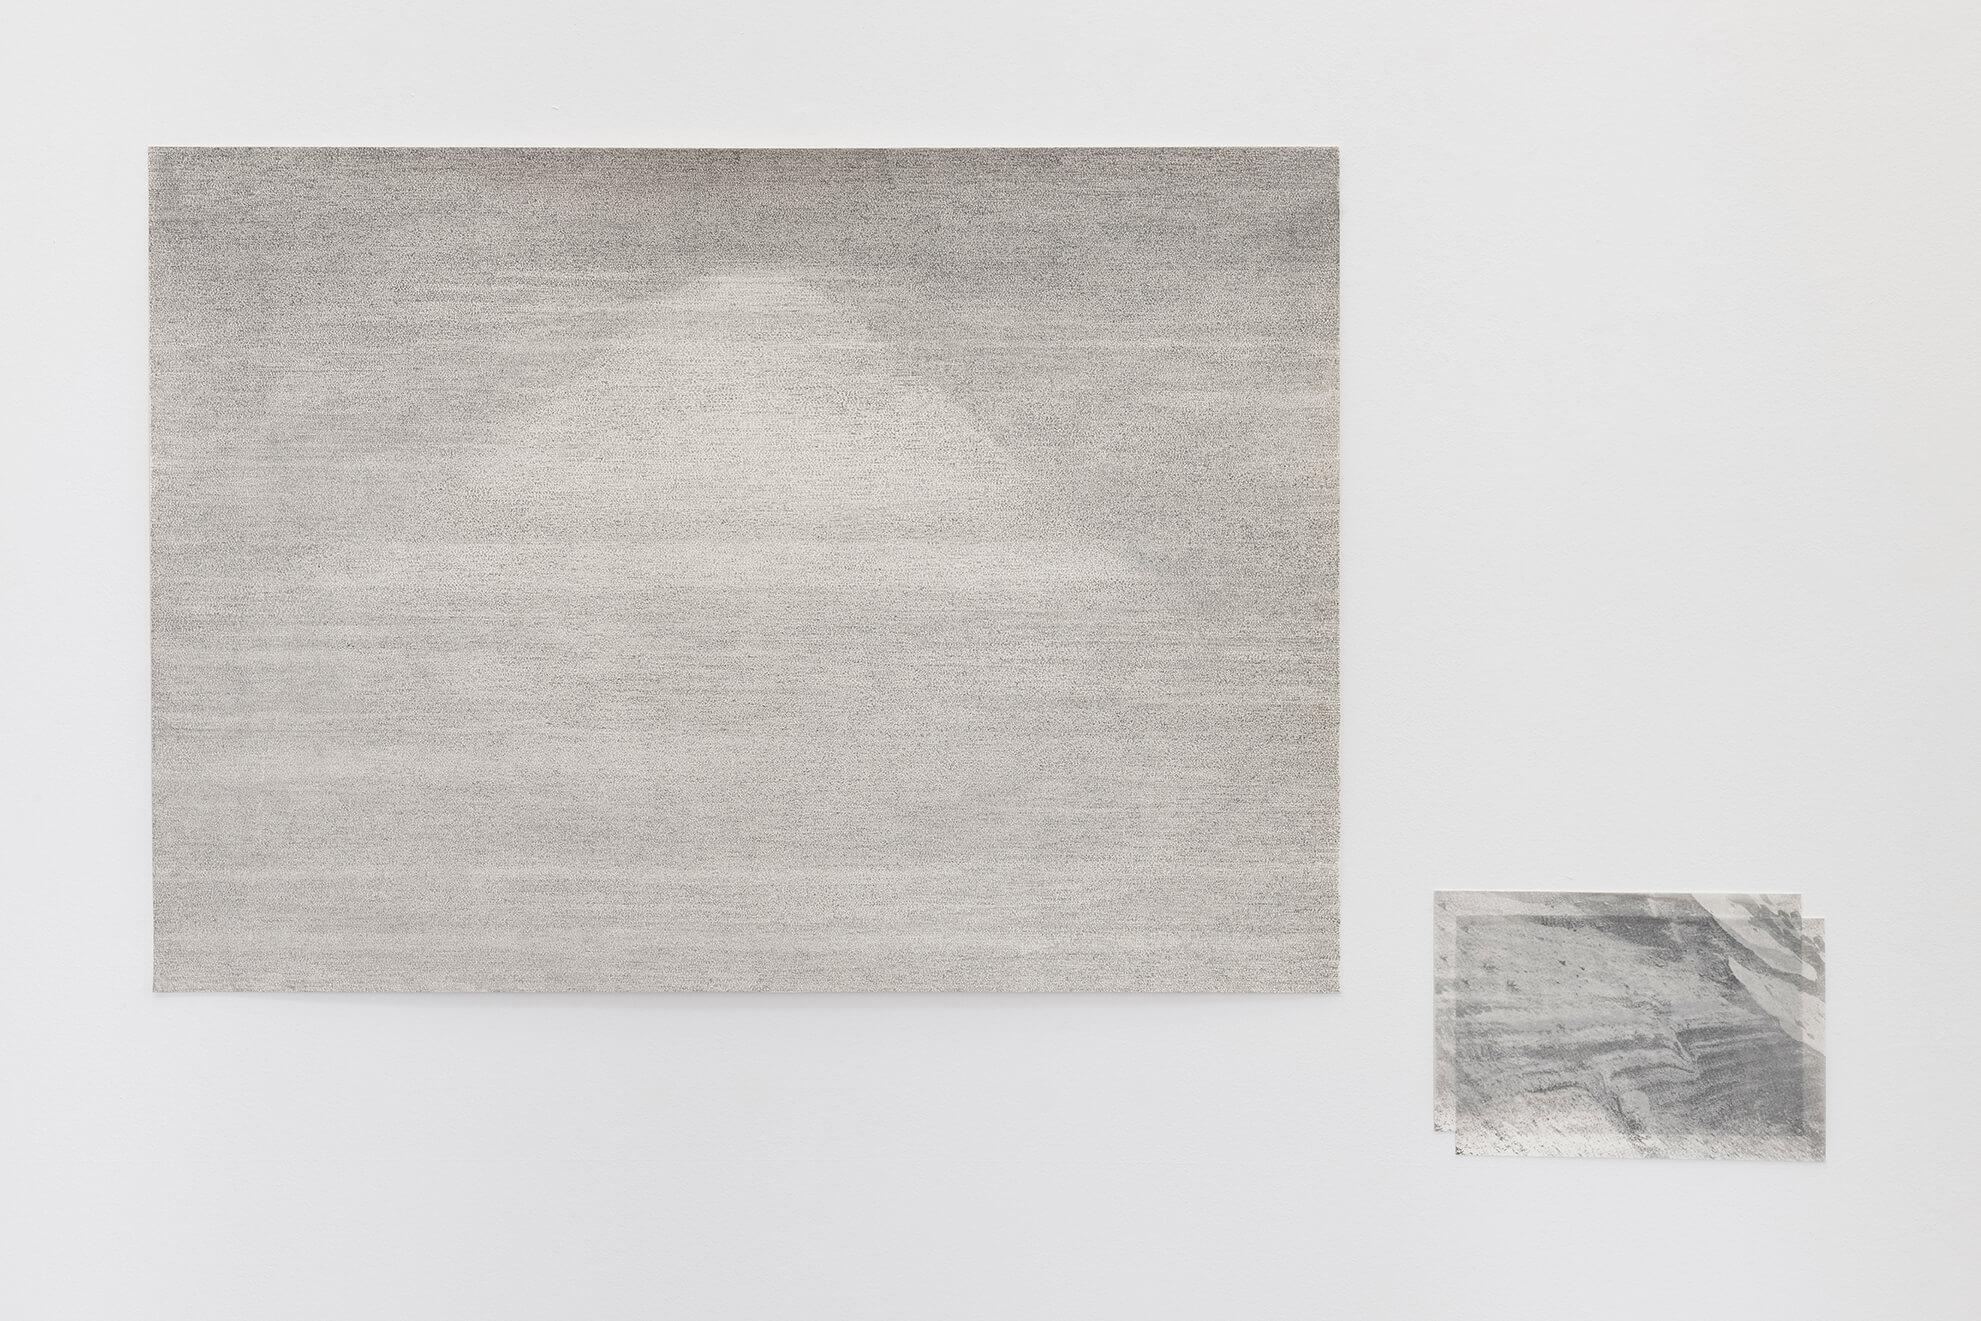 PATRICIA DAUDER.Mount & Landslide, 2020 | El Museu Imaginari / El Museo Imaginario / The Imaginary Museum | ProjecteSD